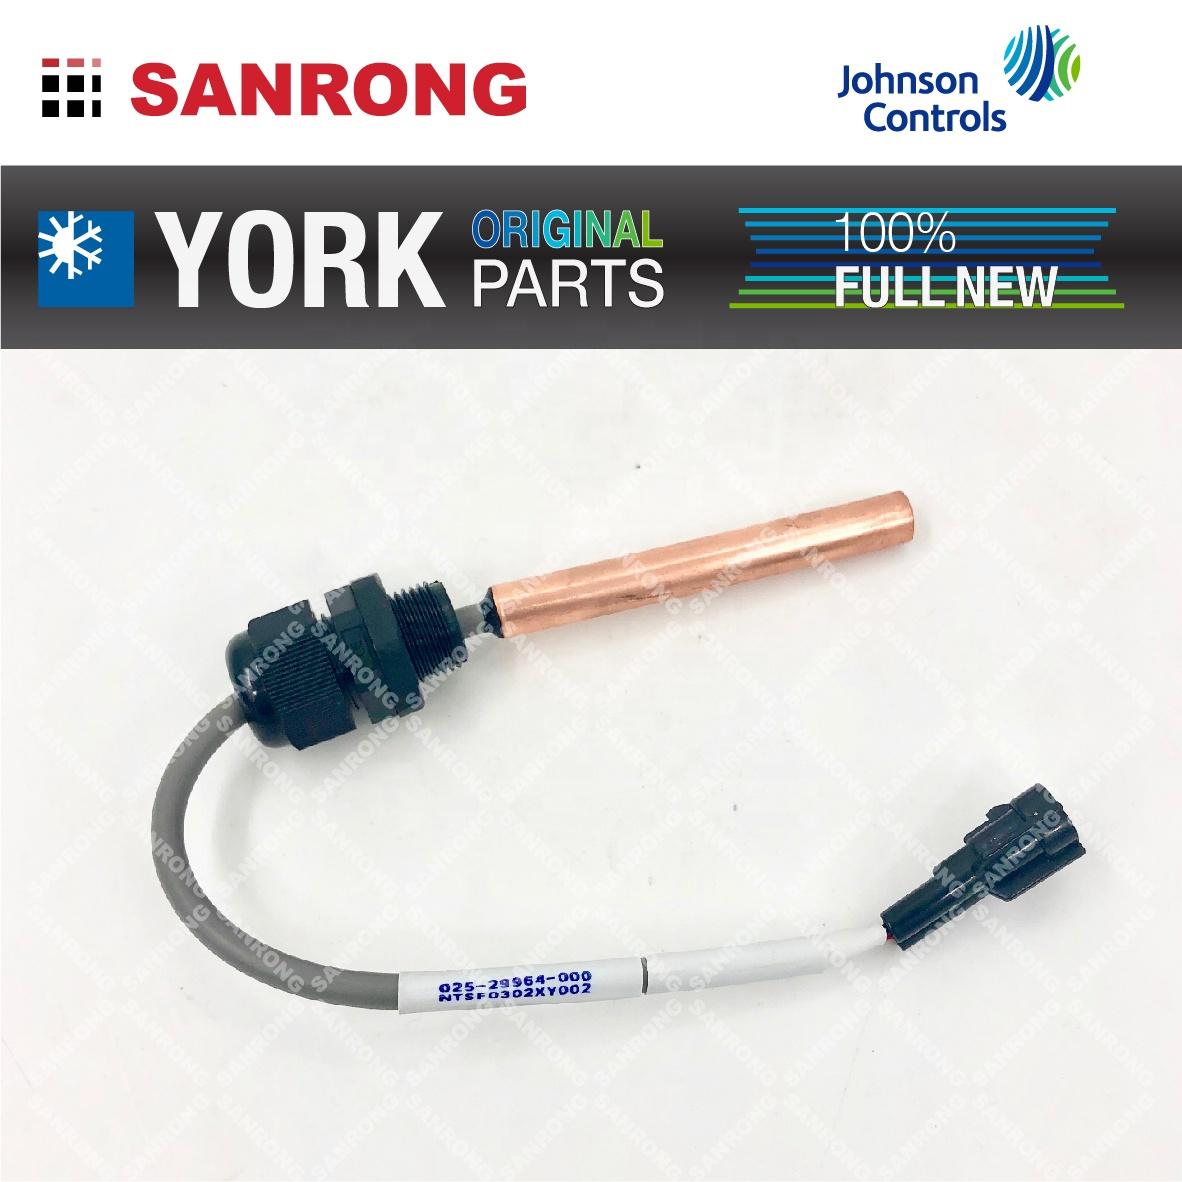 York Refrigeration Parts 025-29964-000 Water Temp Sensor. View York Chiller Parts. York Product Details from Shanghai Xinchang Refrigeration ...